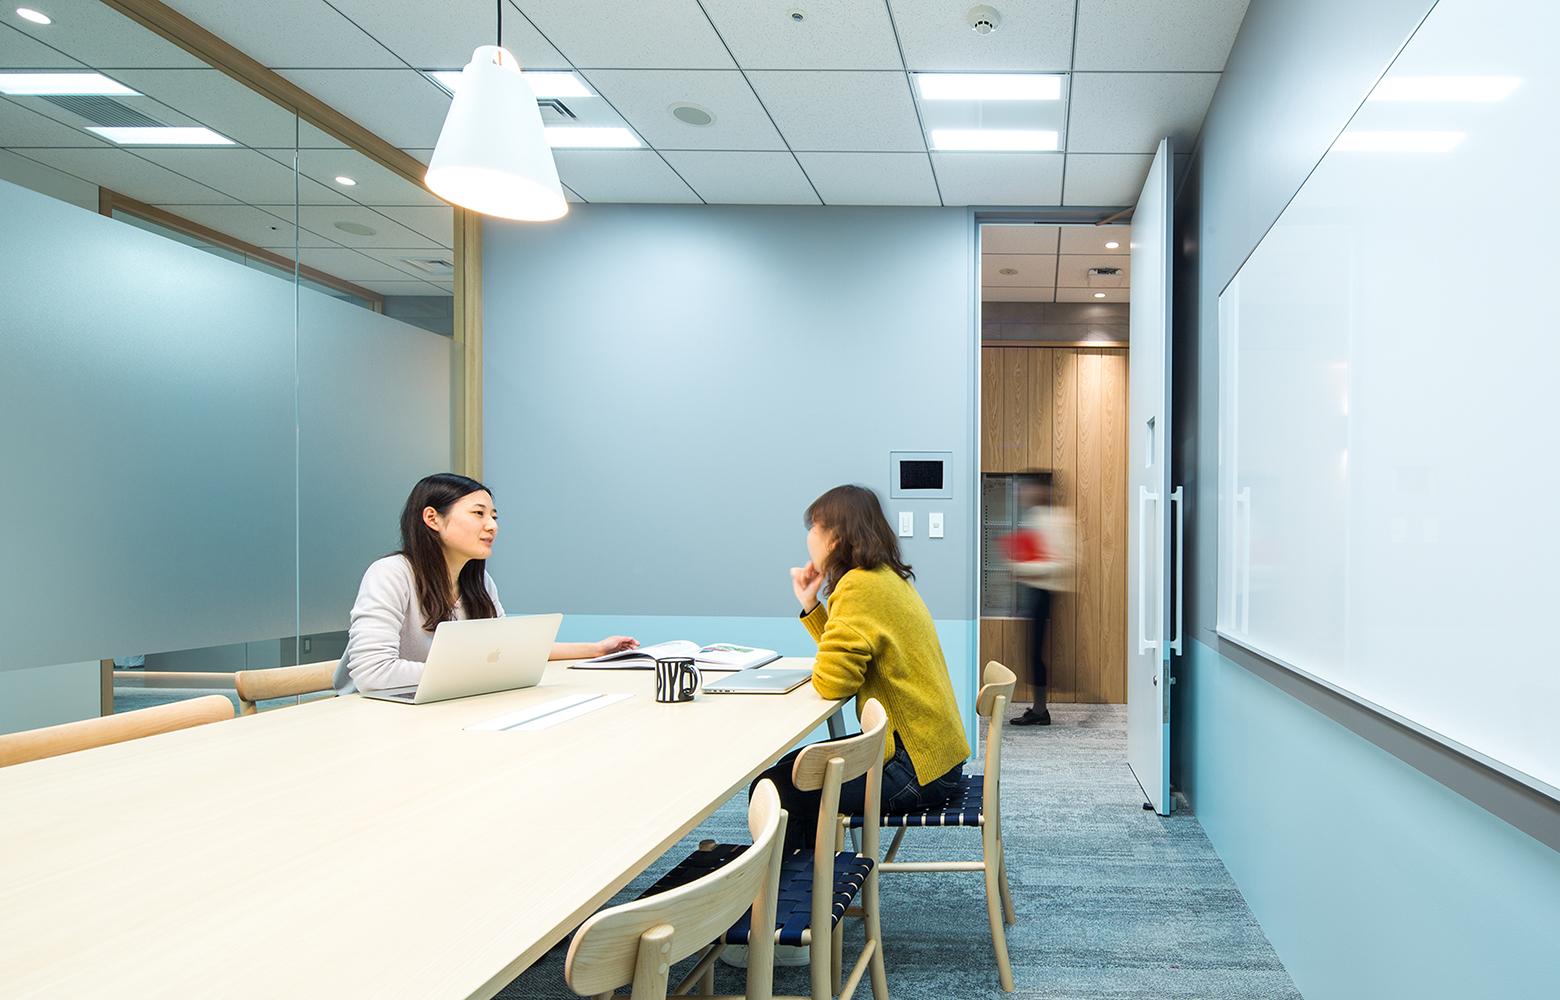 KLab株式会社 Roppongi Office Meeting Room デザイン・レイアウト事例